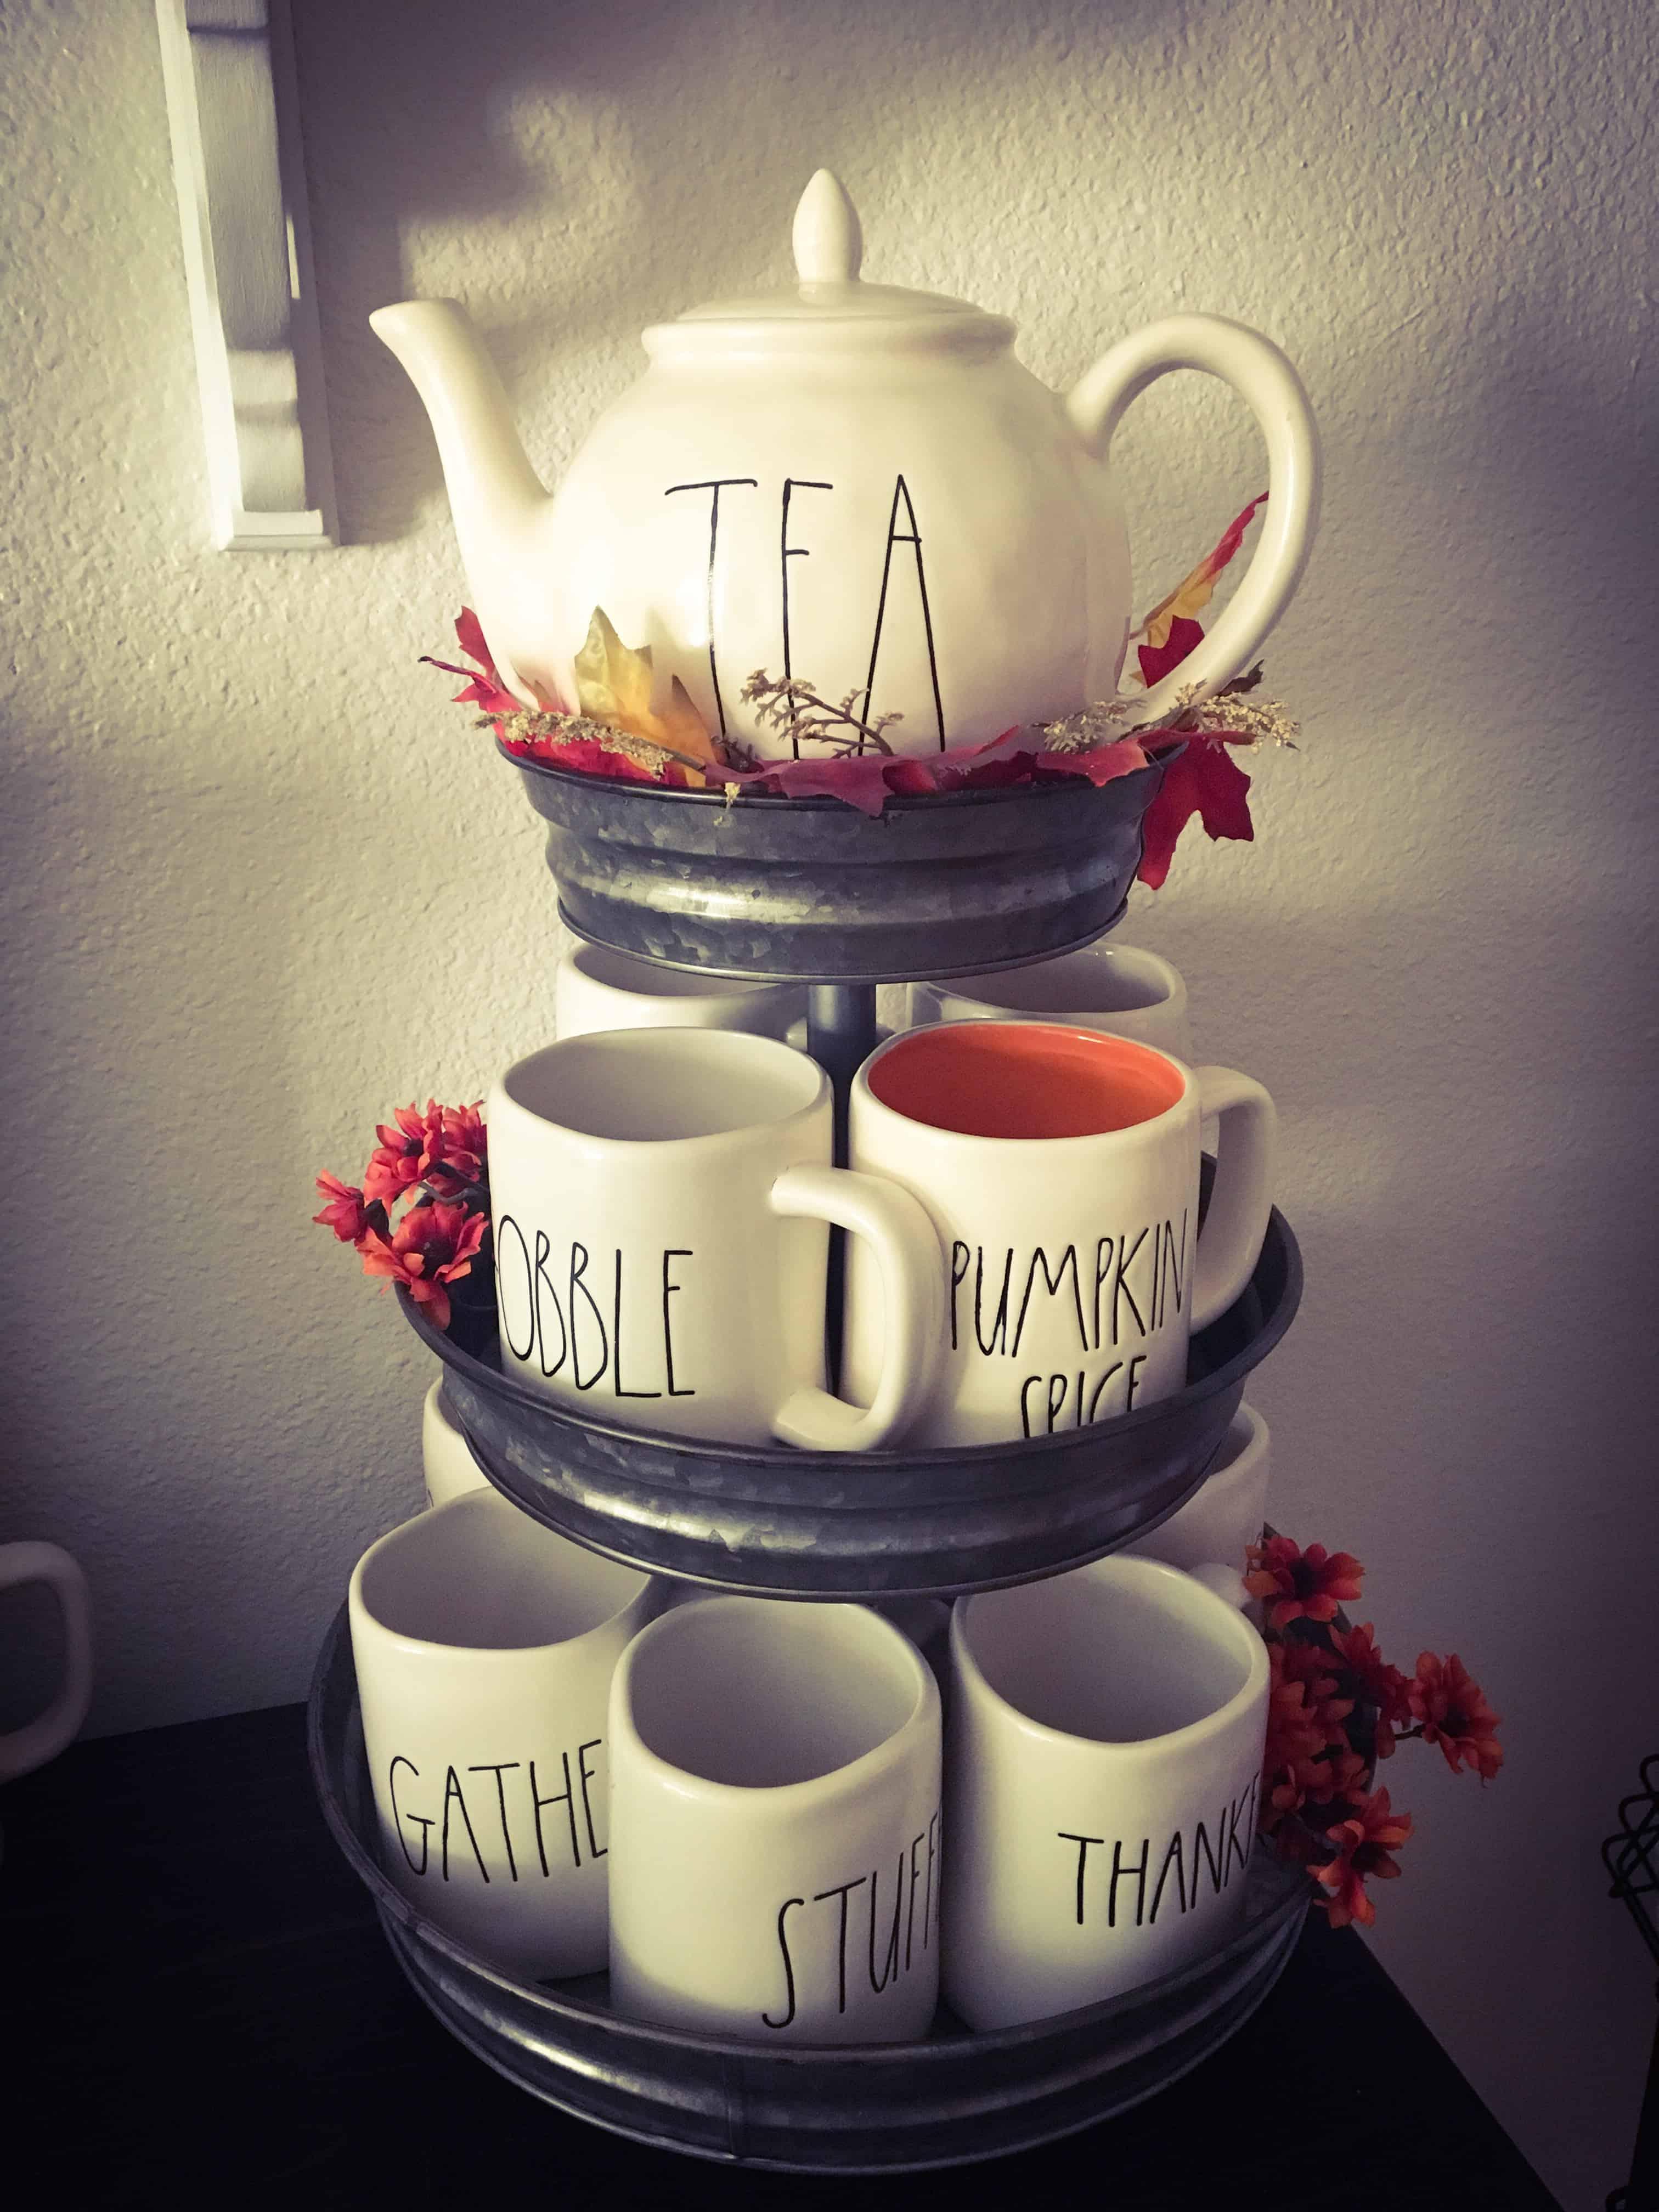 Mug Racks Every Coffee And Tea Lover Should See